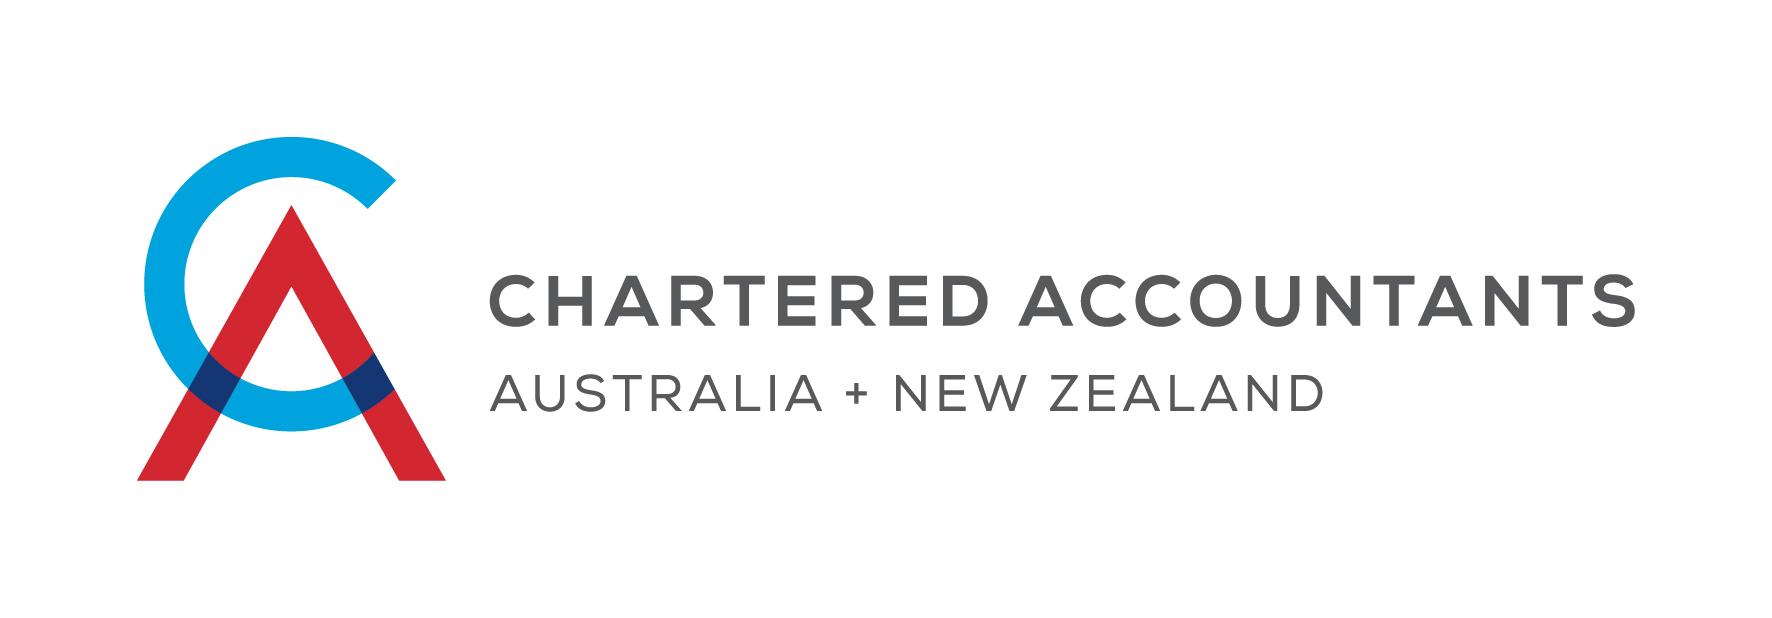 chartered accounts australia + new zealand.png